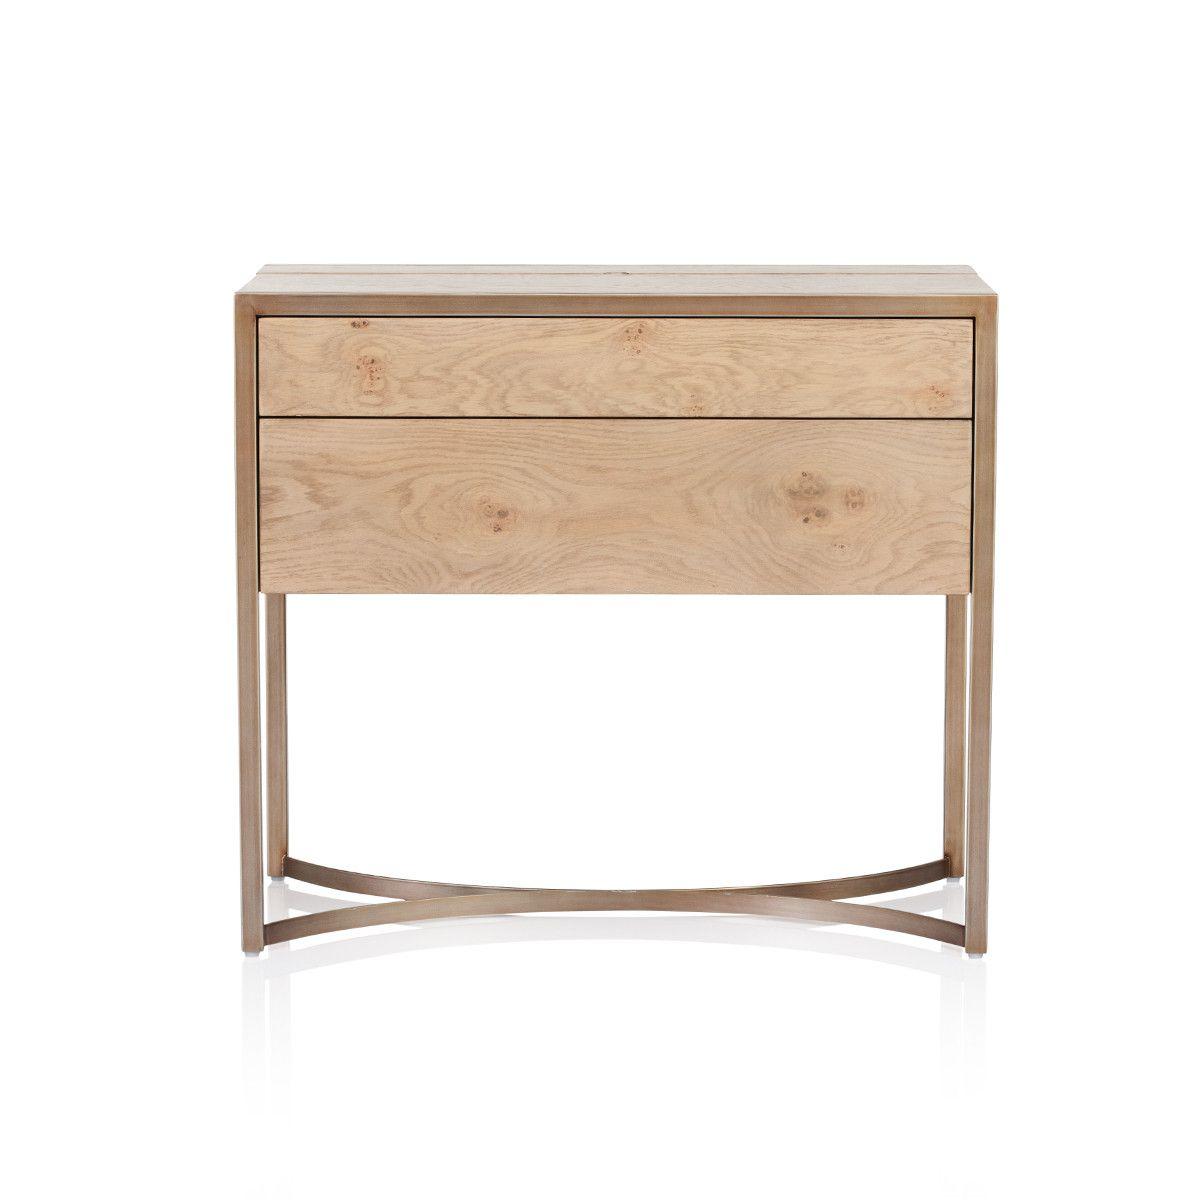 Max Sparrow Manhattan Light Oak Side Table Wooden Bedside Table